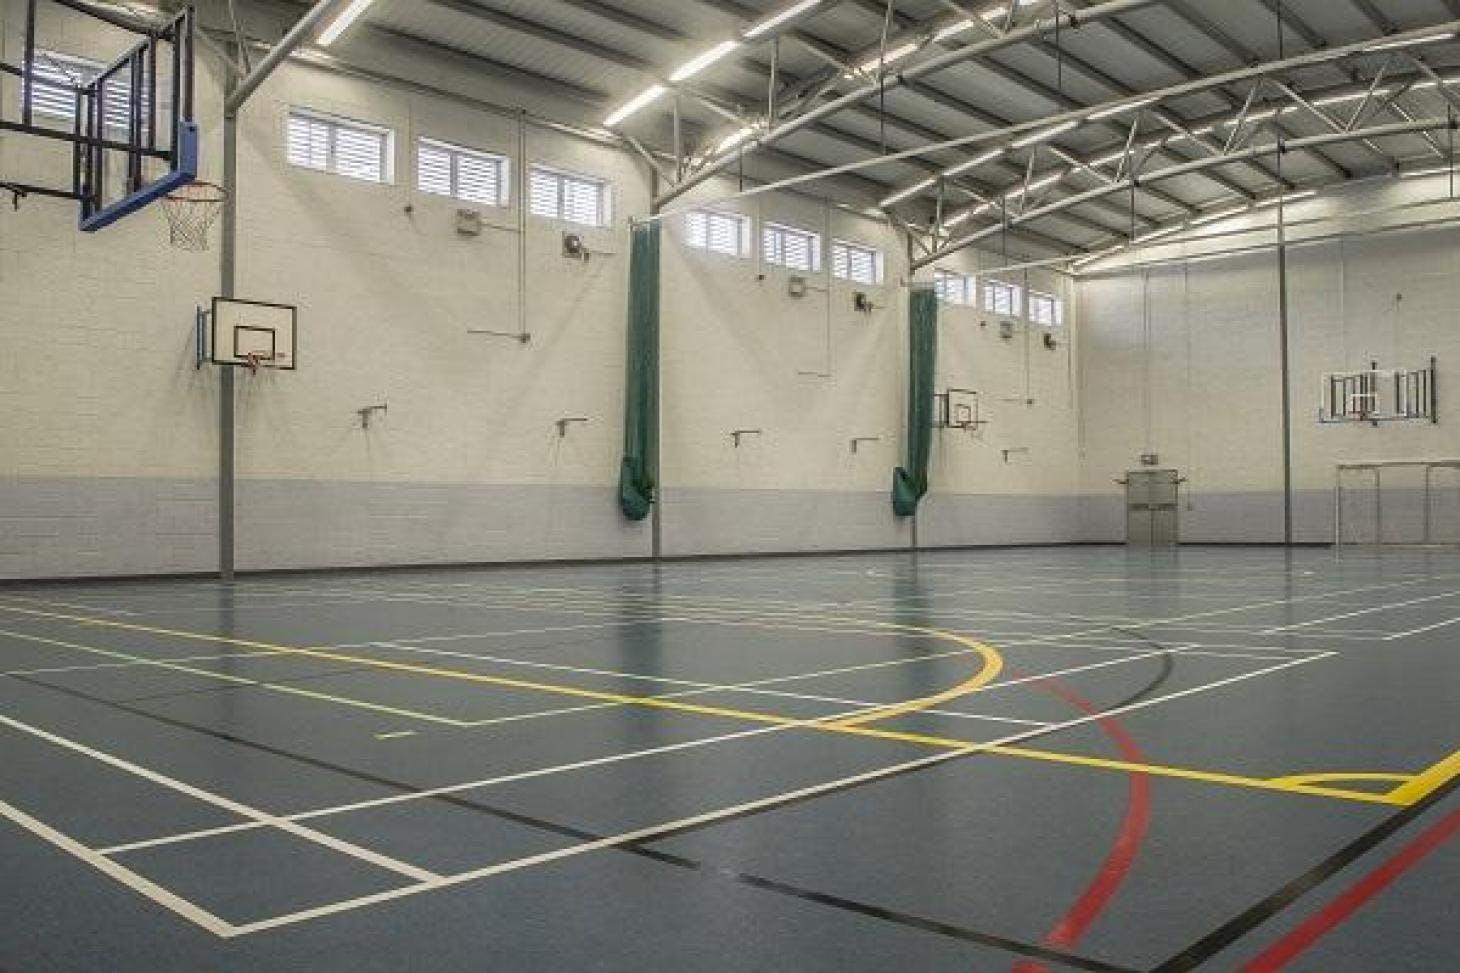 Corduff Sports Centre Indoor futsal pitch